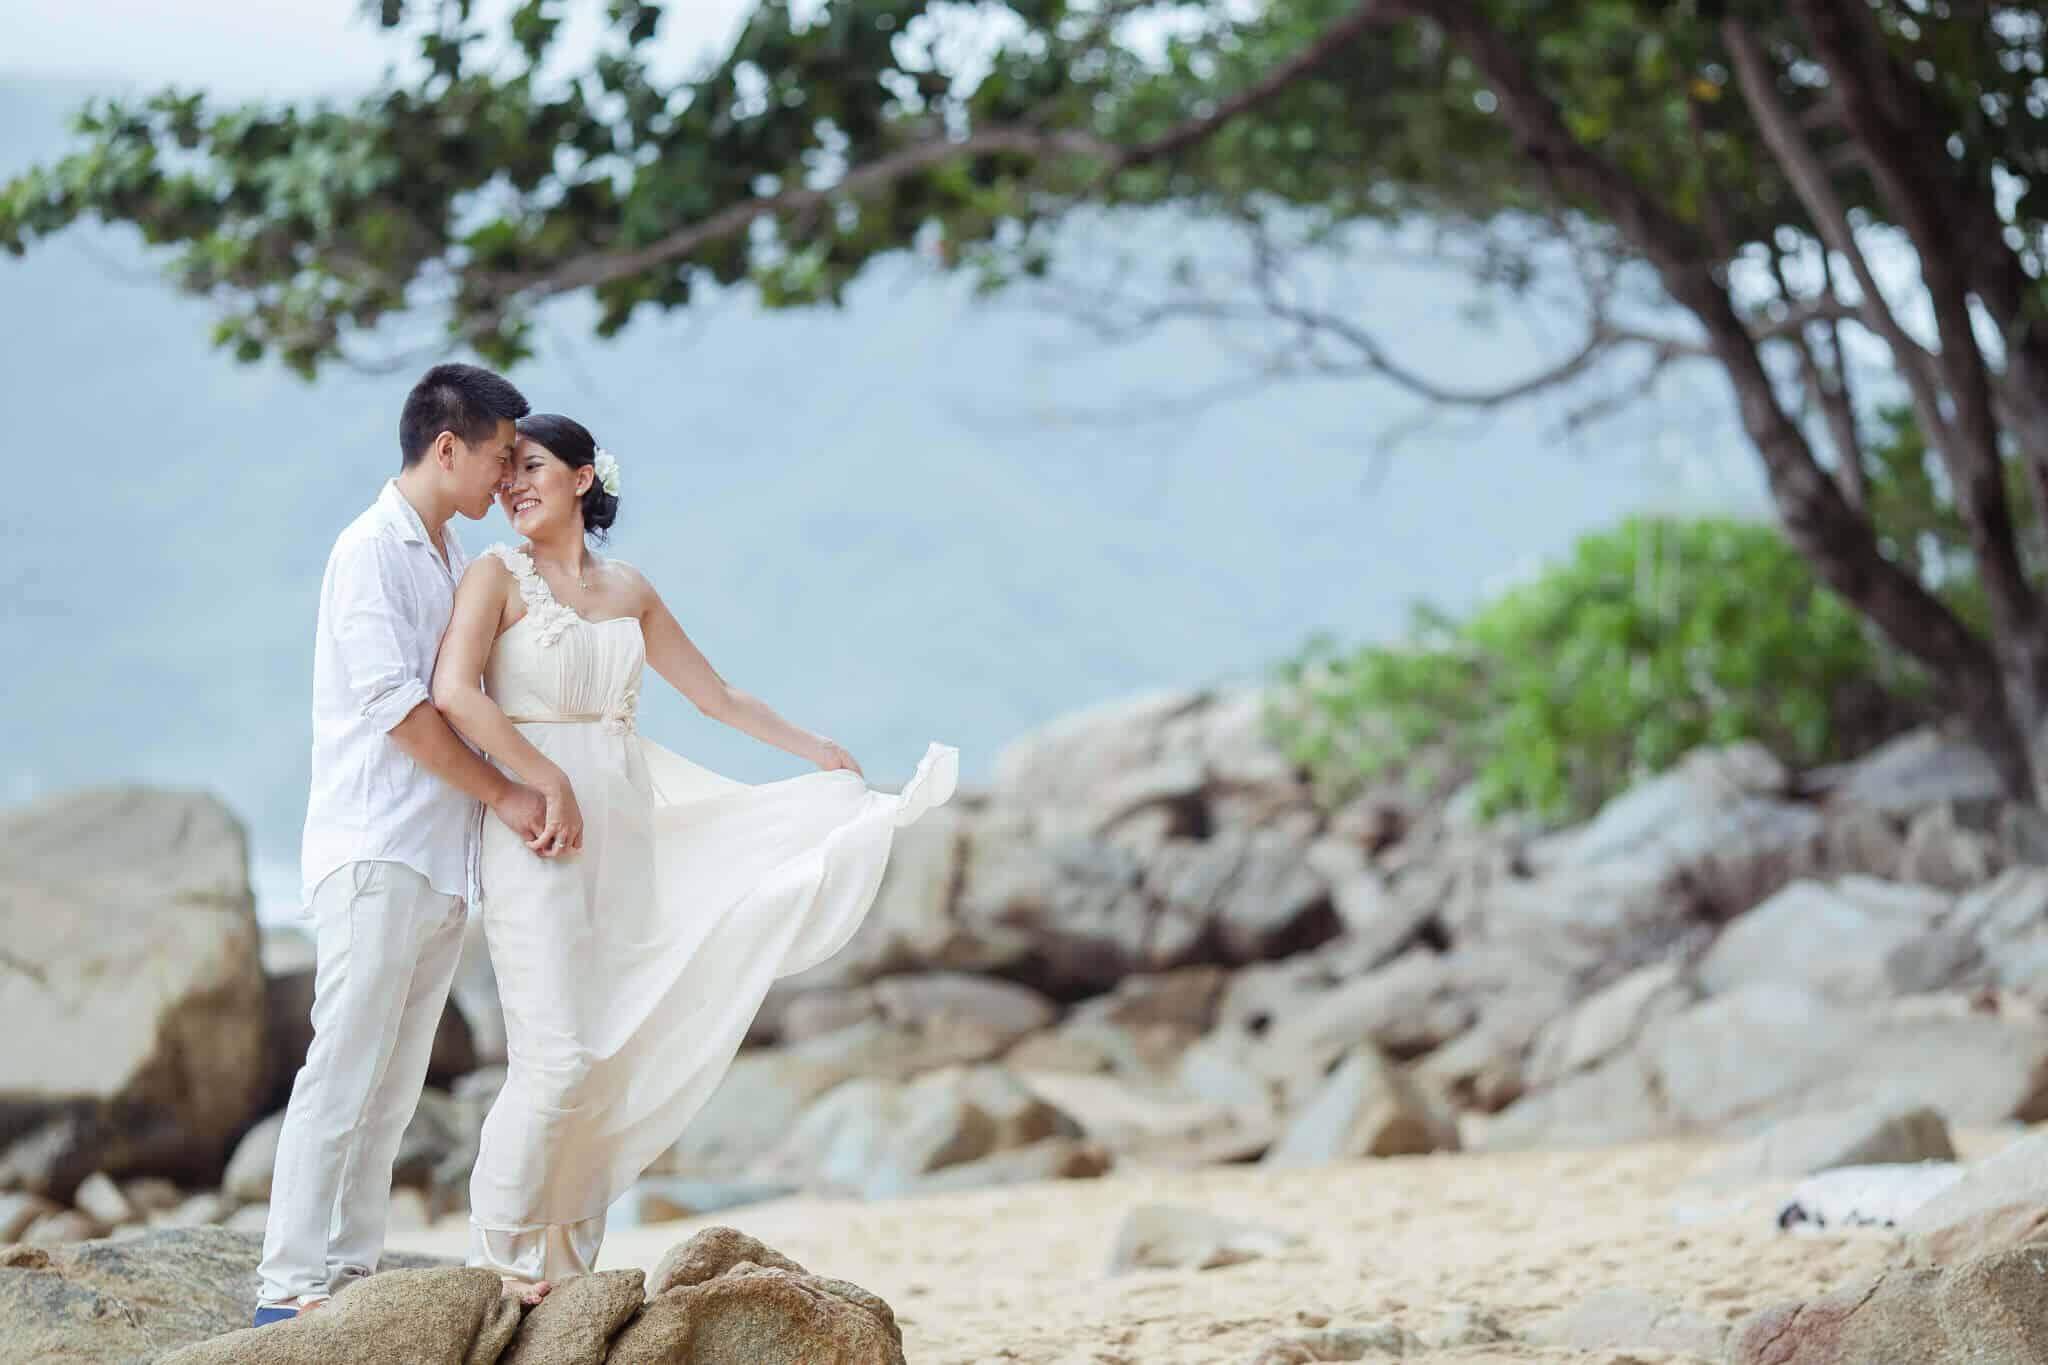 Bride and Groom Wedding Photography Wedding Planners Phuket Thailand